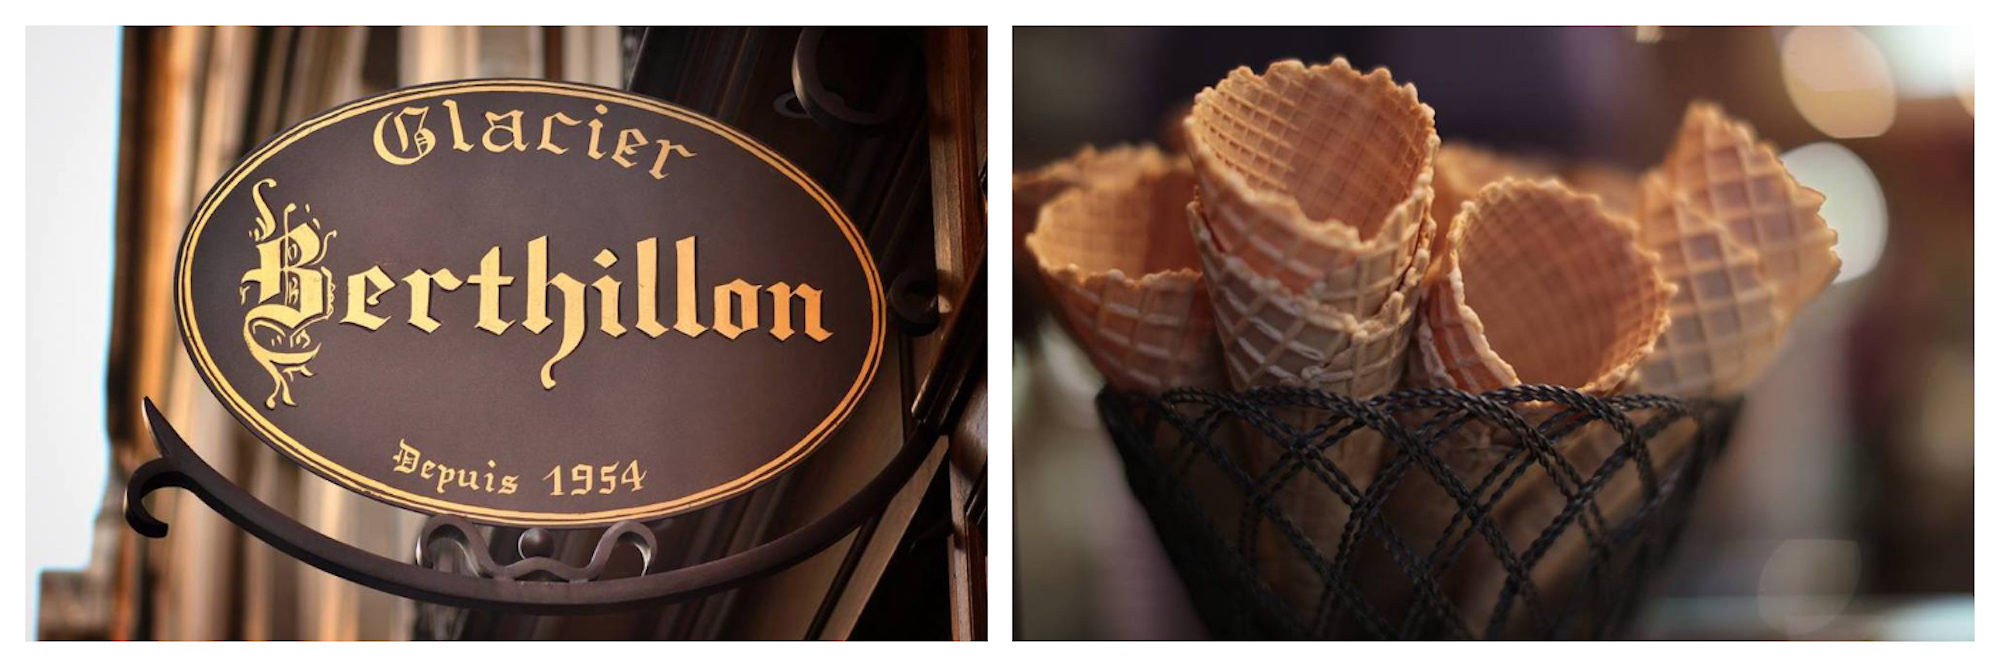 There's no place like Berthillon for ice cream in Paris (left). Delicate Berthillon ice cream cones in a wire basket (right).